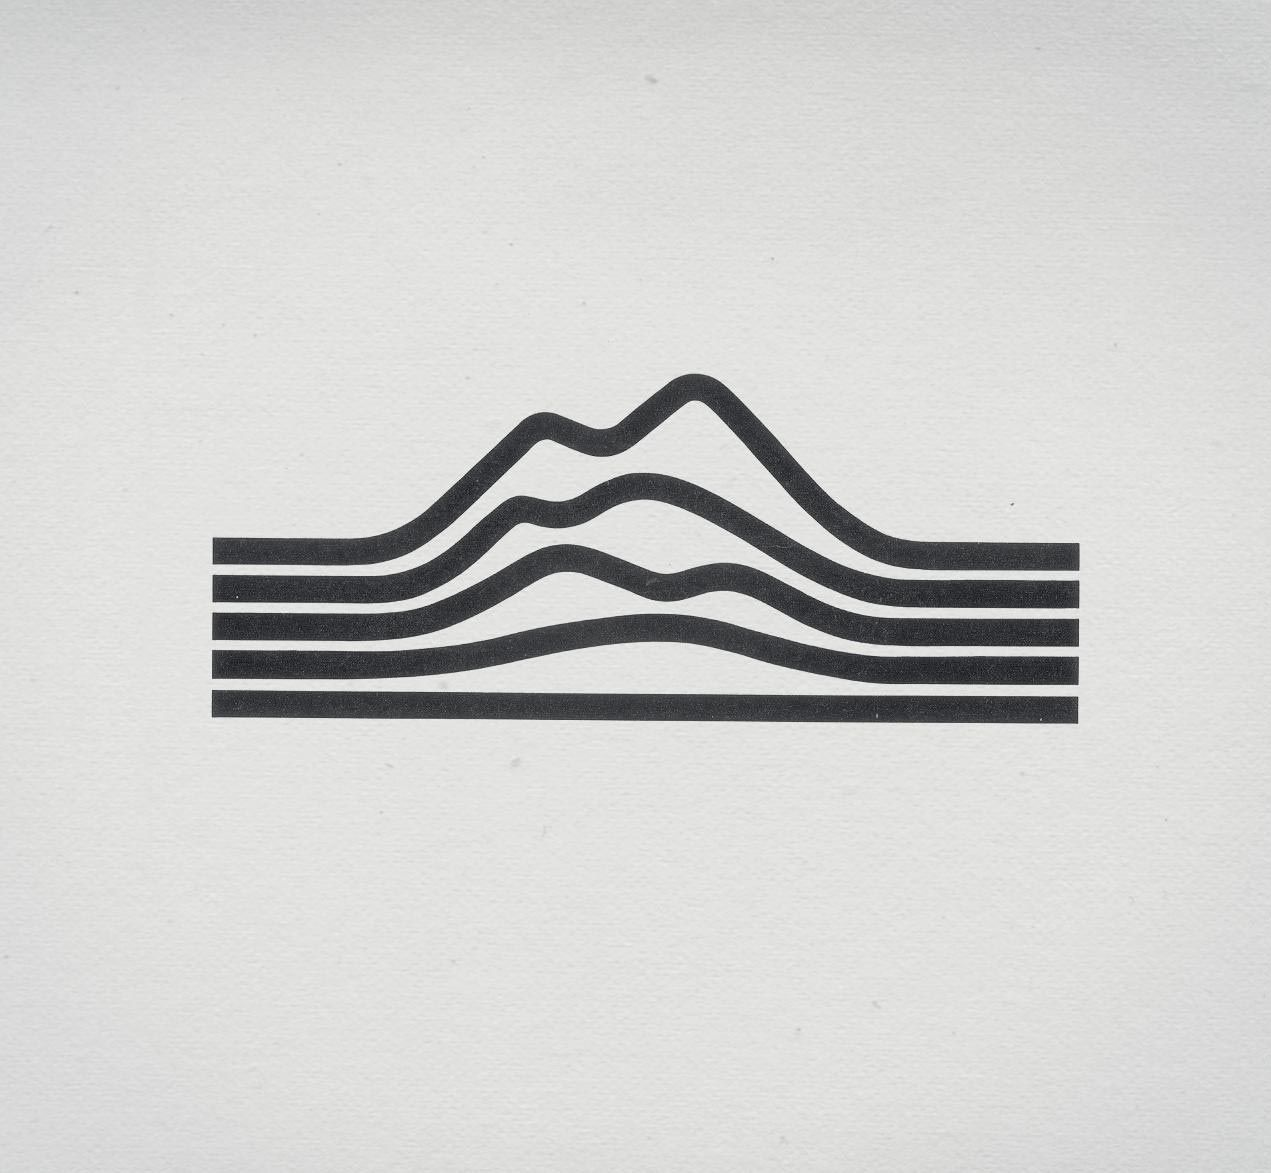 Google themes aesthetic - Elinor Theme The Dry Creek Lodge Logo Wyoming Photo By Jordan Lloyd